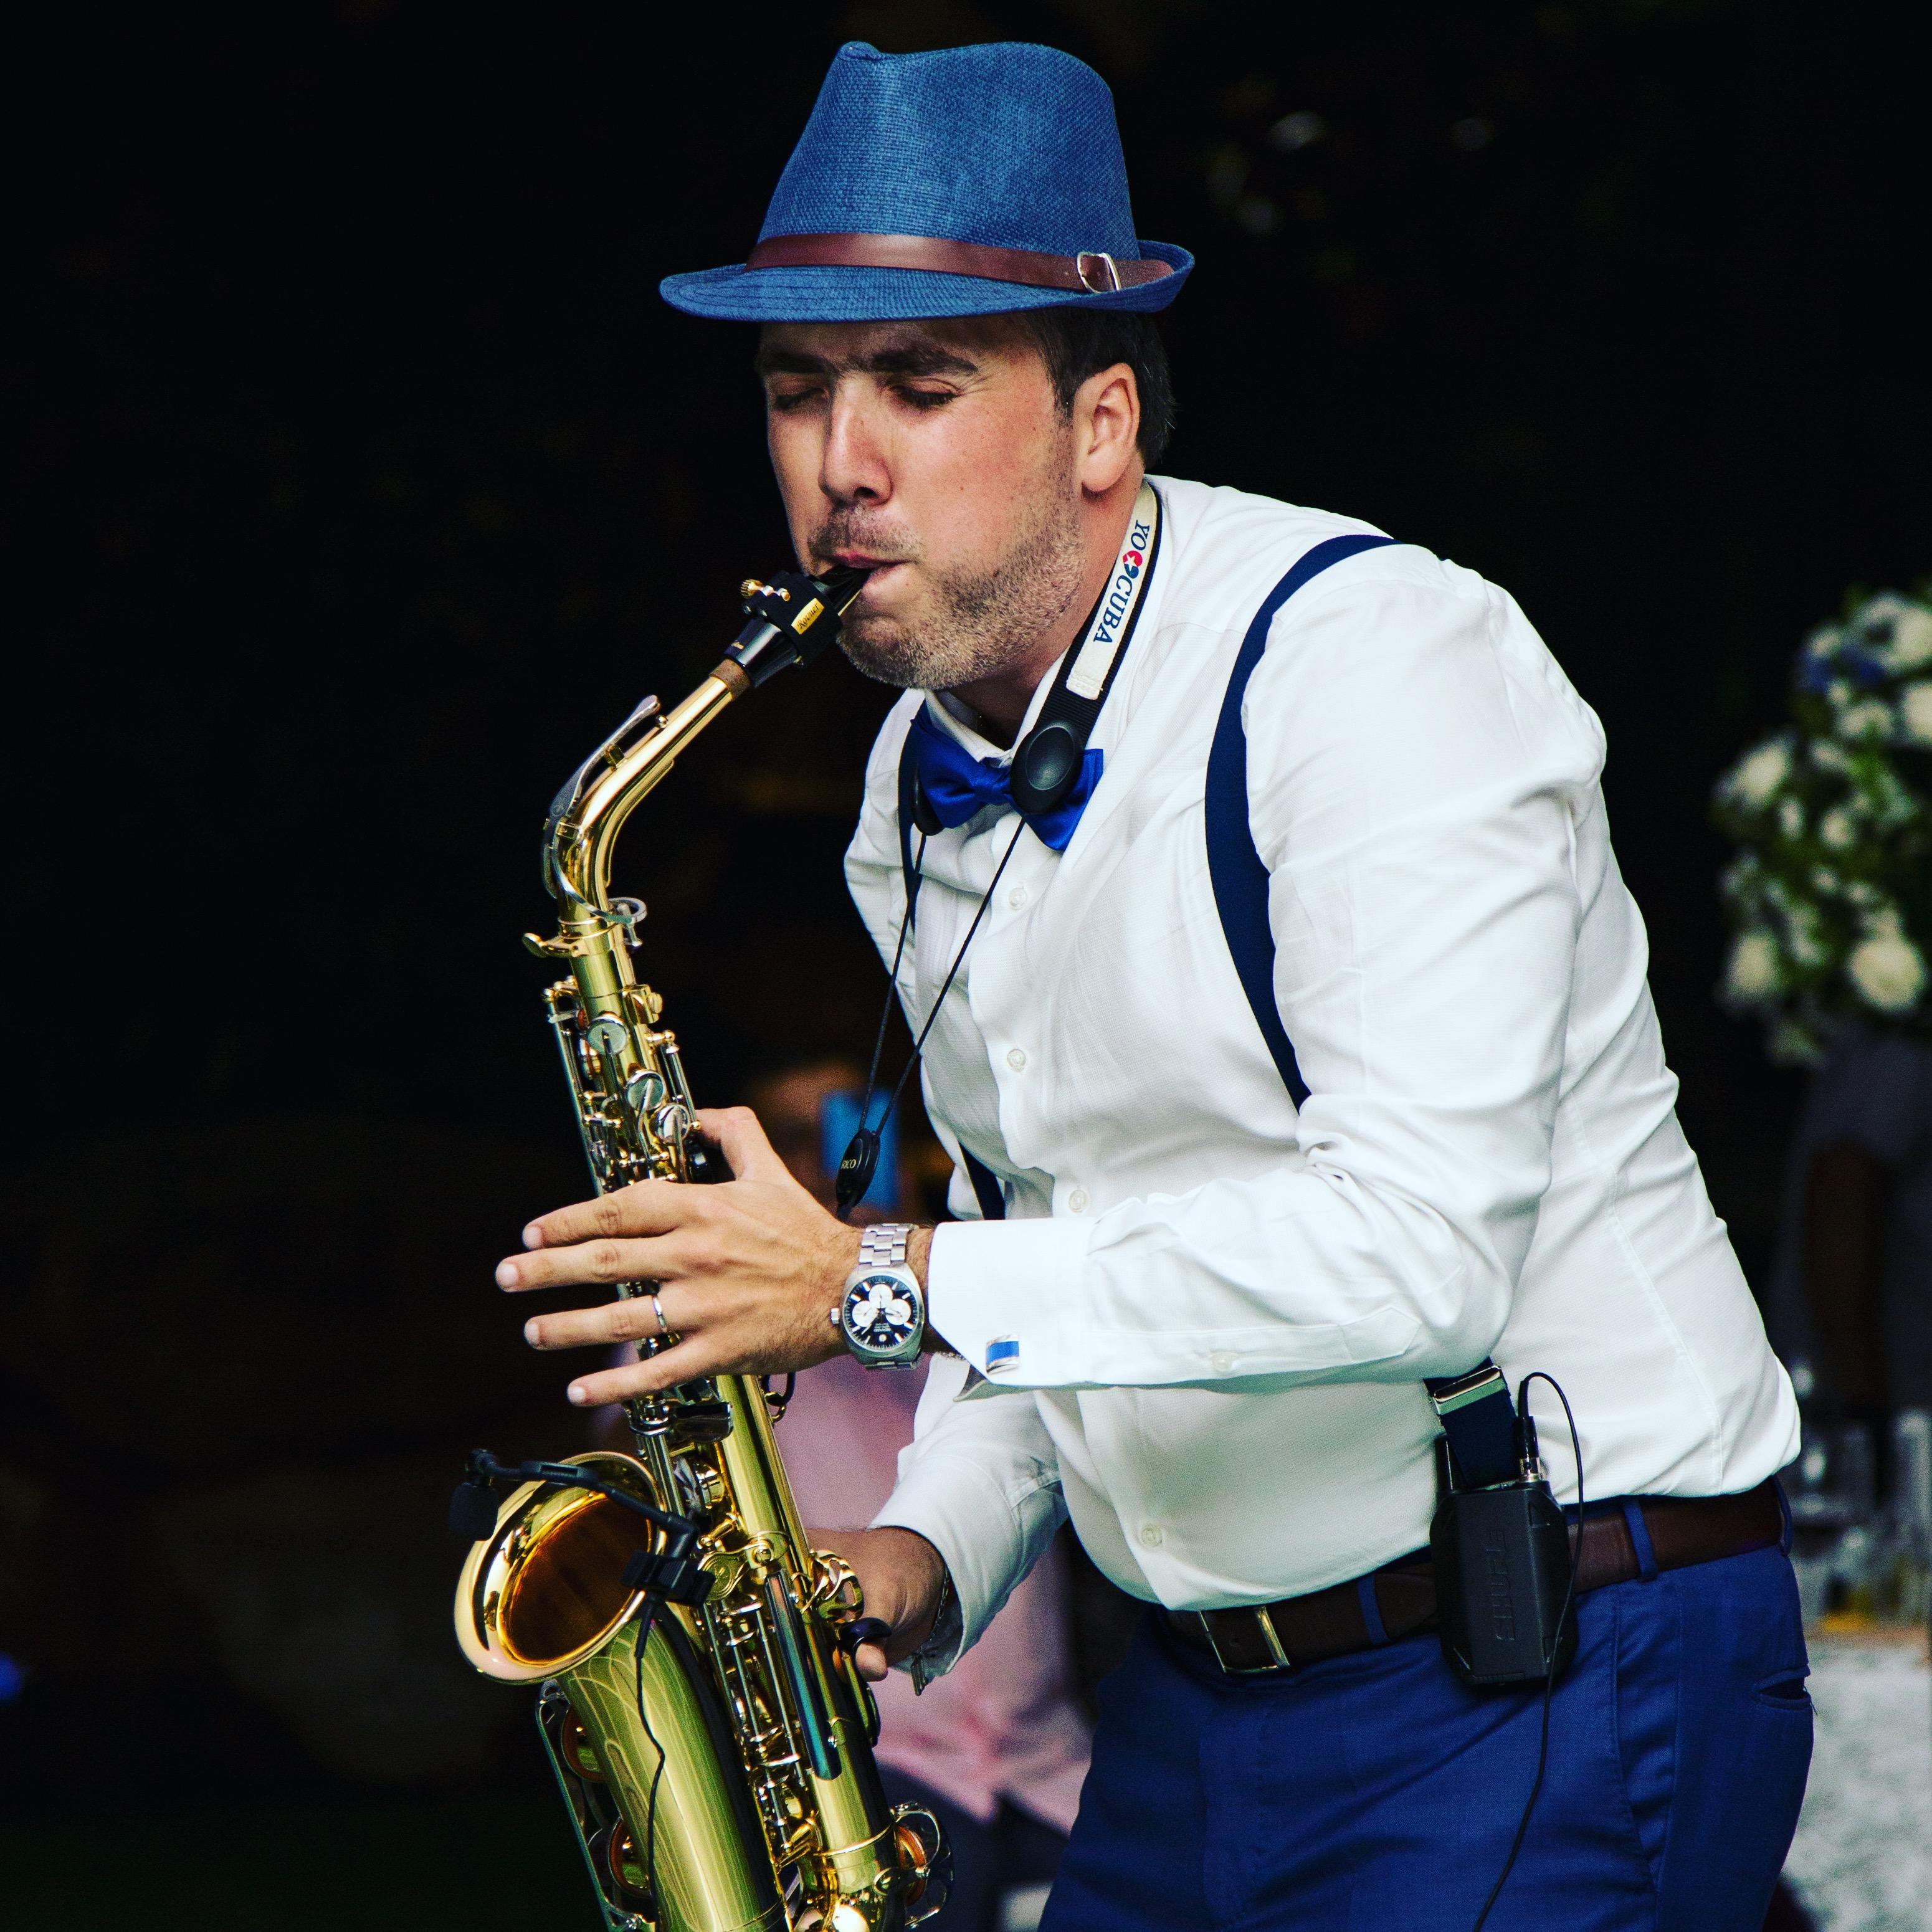 Saxofonista en mexico eventos fiestas